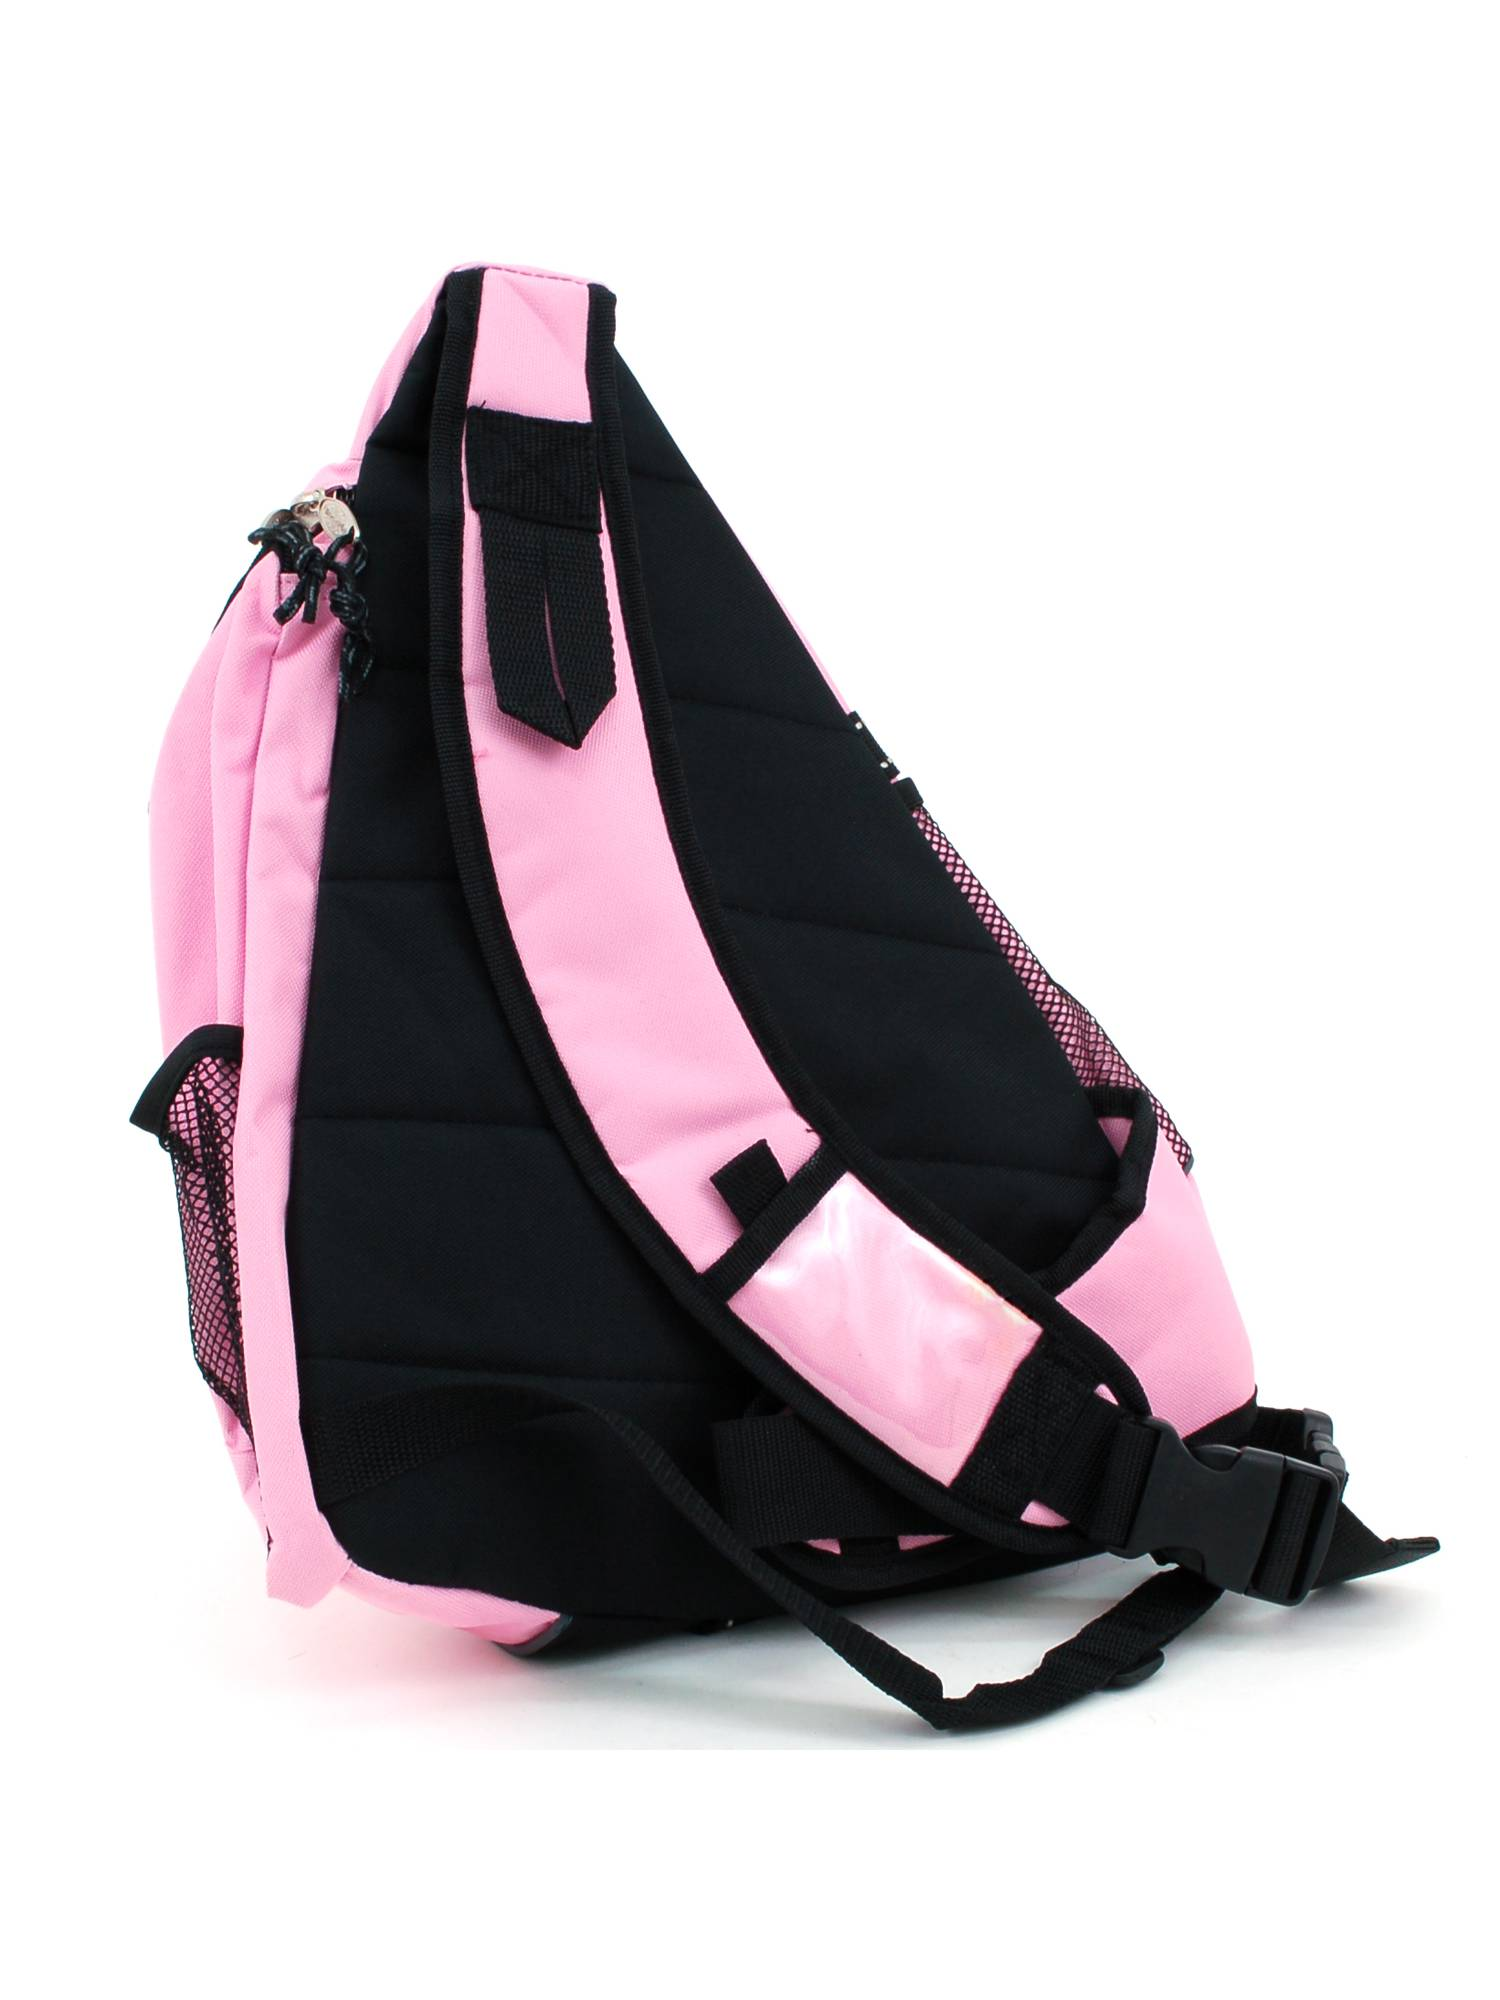 87a21a210ffd Transworld - Backpack Messenger Bag Cross Body Organizer Single Strap Sling  Shoulder Carryall - Walmart.com